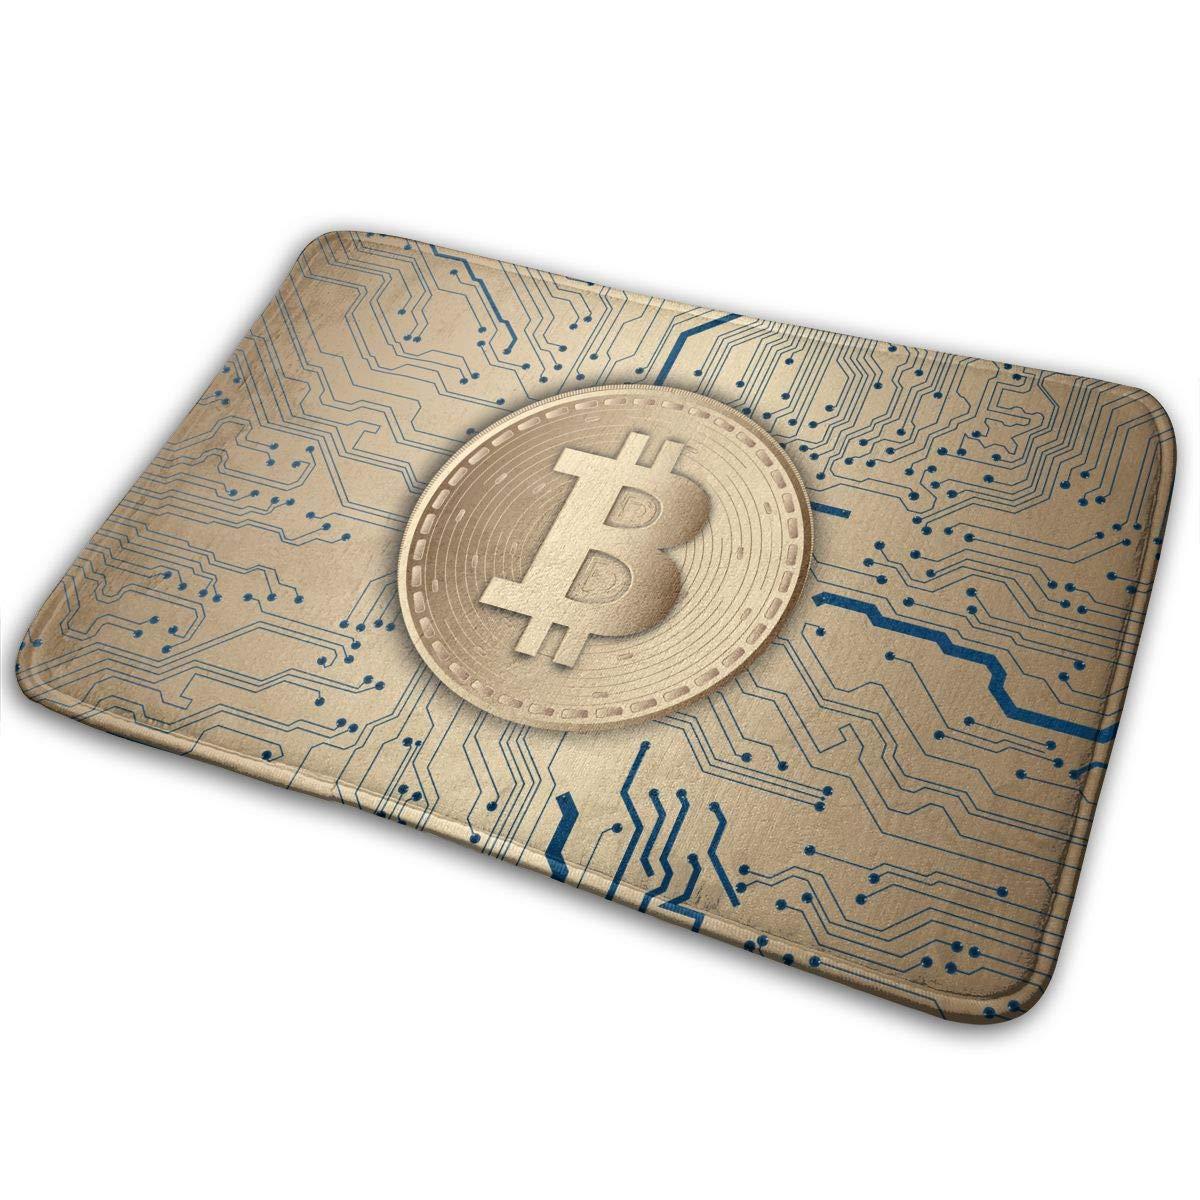 JTLCBC Bitcoin Currency Technology Money Cryptocurrency Entrance Mat Floor Mat Home Decor Carpet Indoor Rectangle Doormat Kitchen Mats